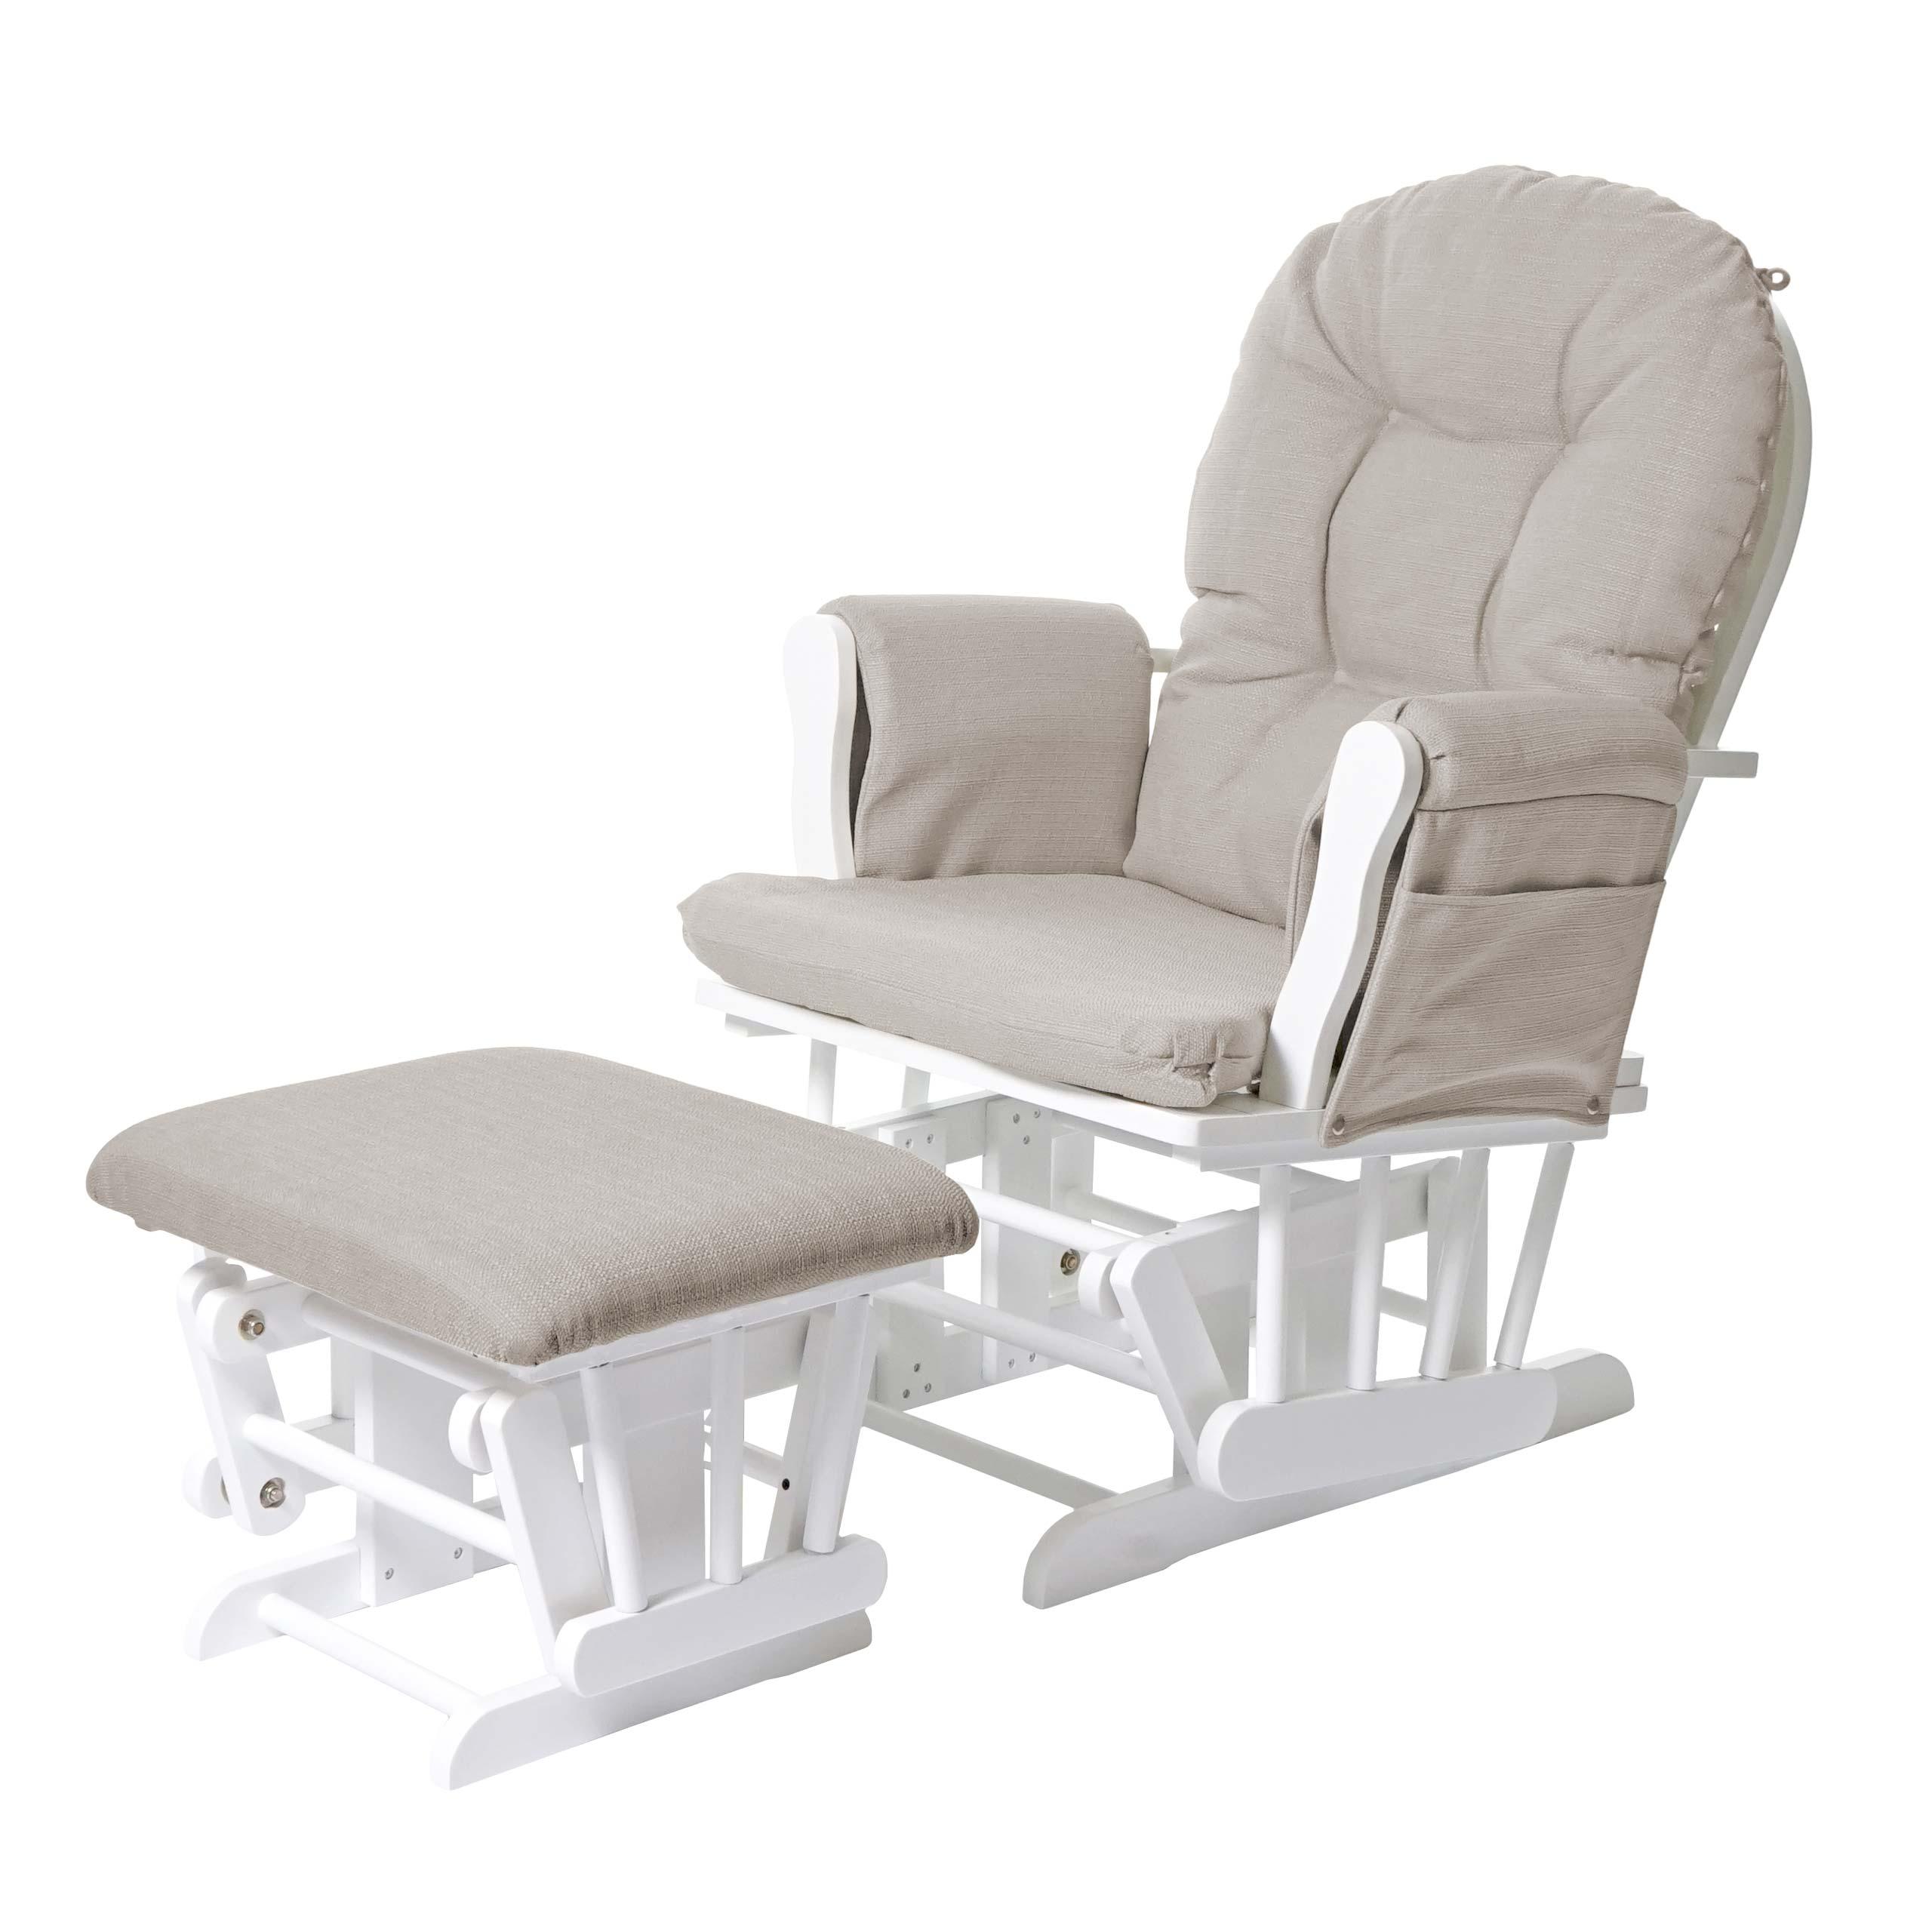 relaxsessel hwc c76 schaukelstuhl sessel schwingstuhl mit hocker stoff textil creme gestell